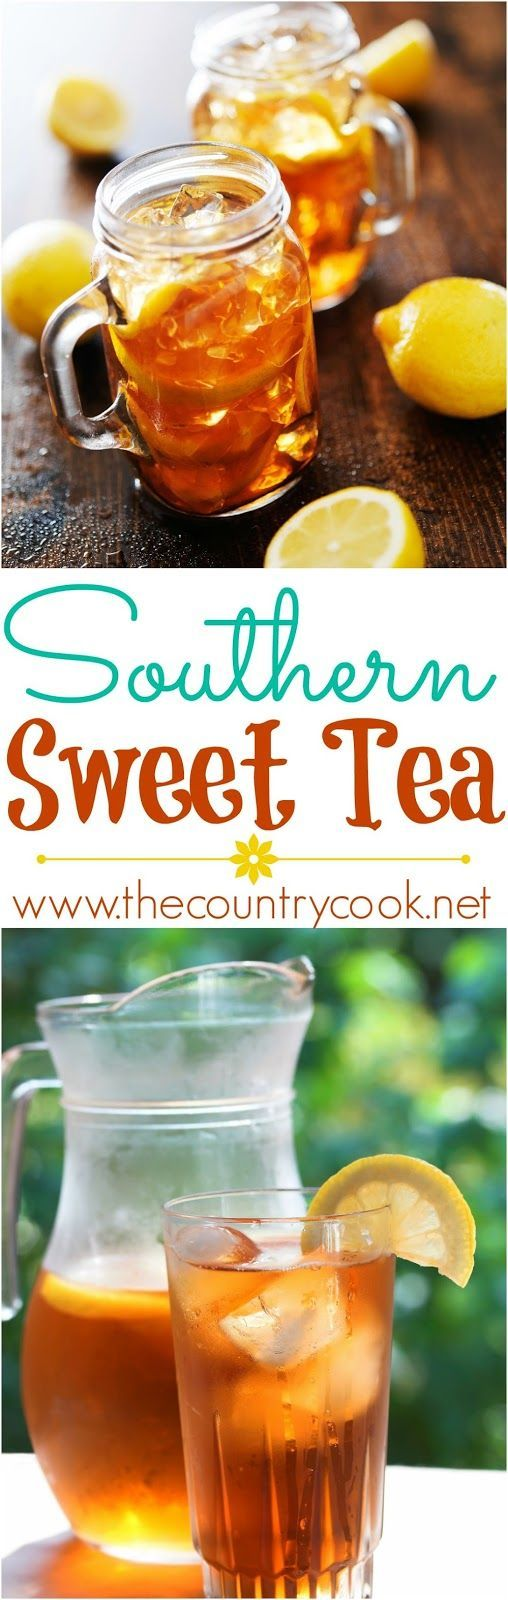 Best 25+ Sweet tea cocktail ideas on Pinterest | Sweet tea ...